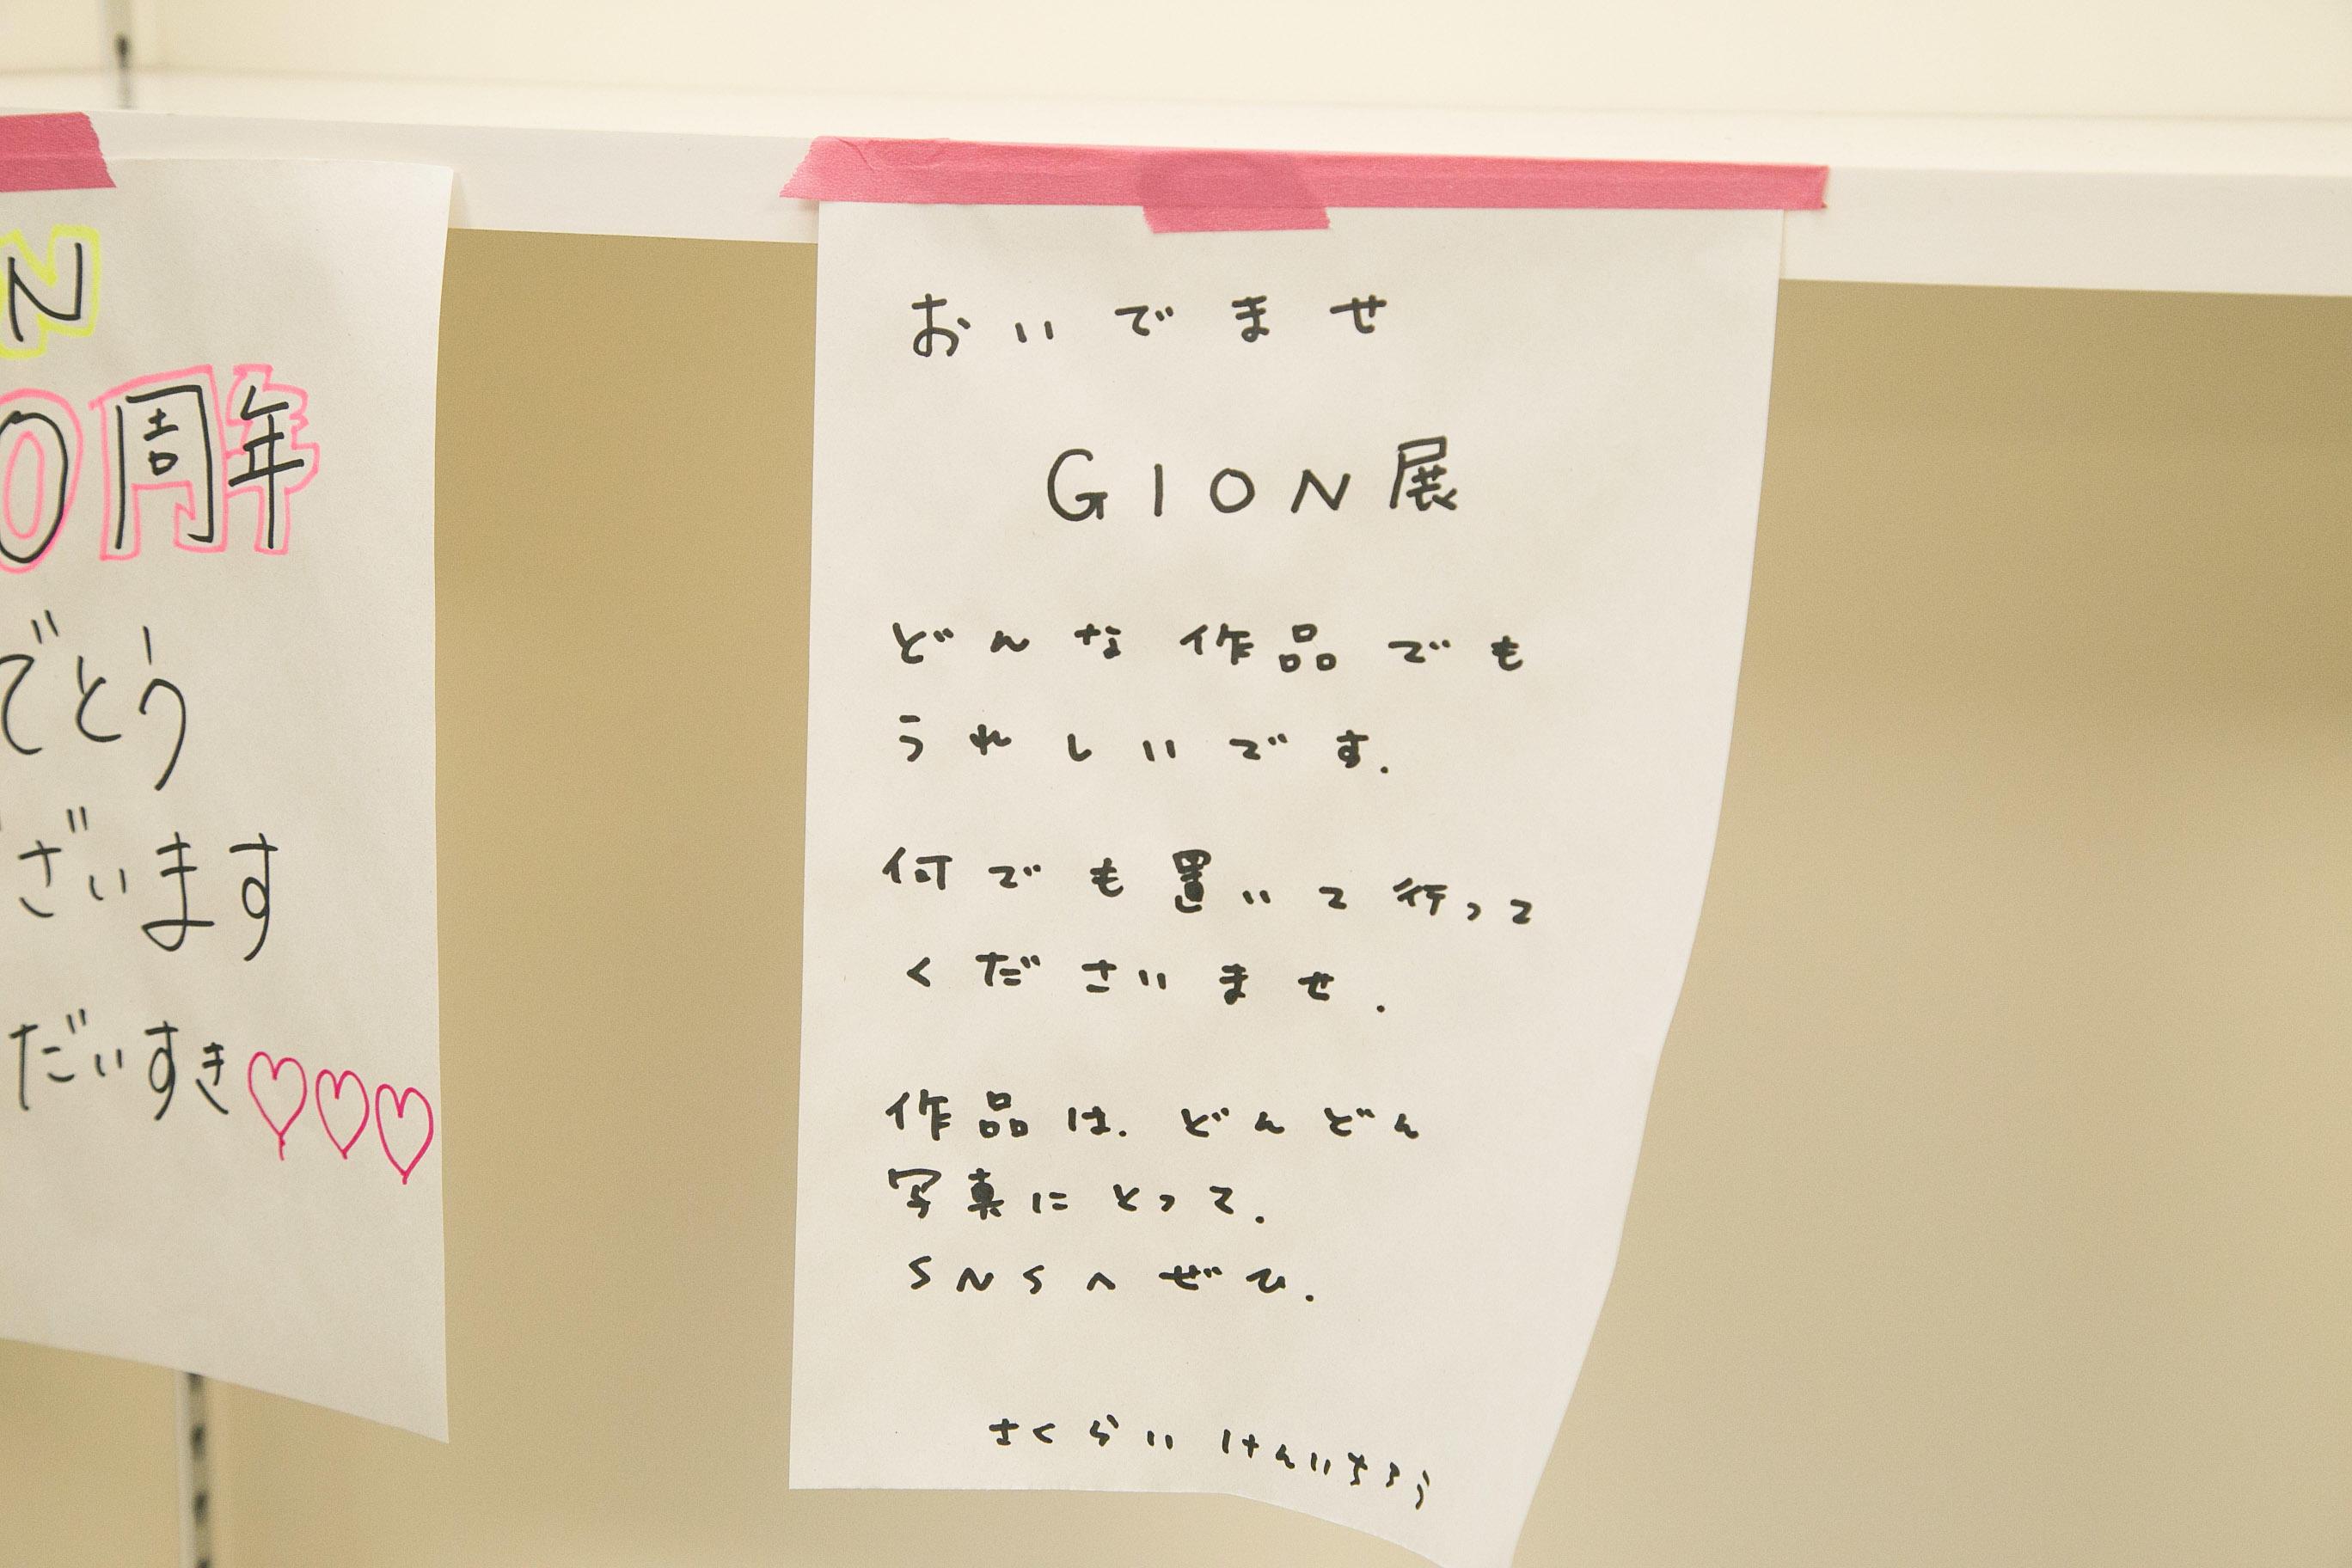 http://news.yoshimoto.co.jp/20180413205917-dd51b46a4accdeabbe50f8ebac9727927c32dc55.jpg